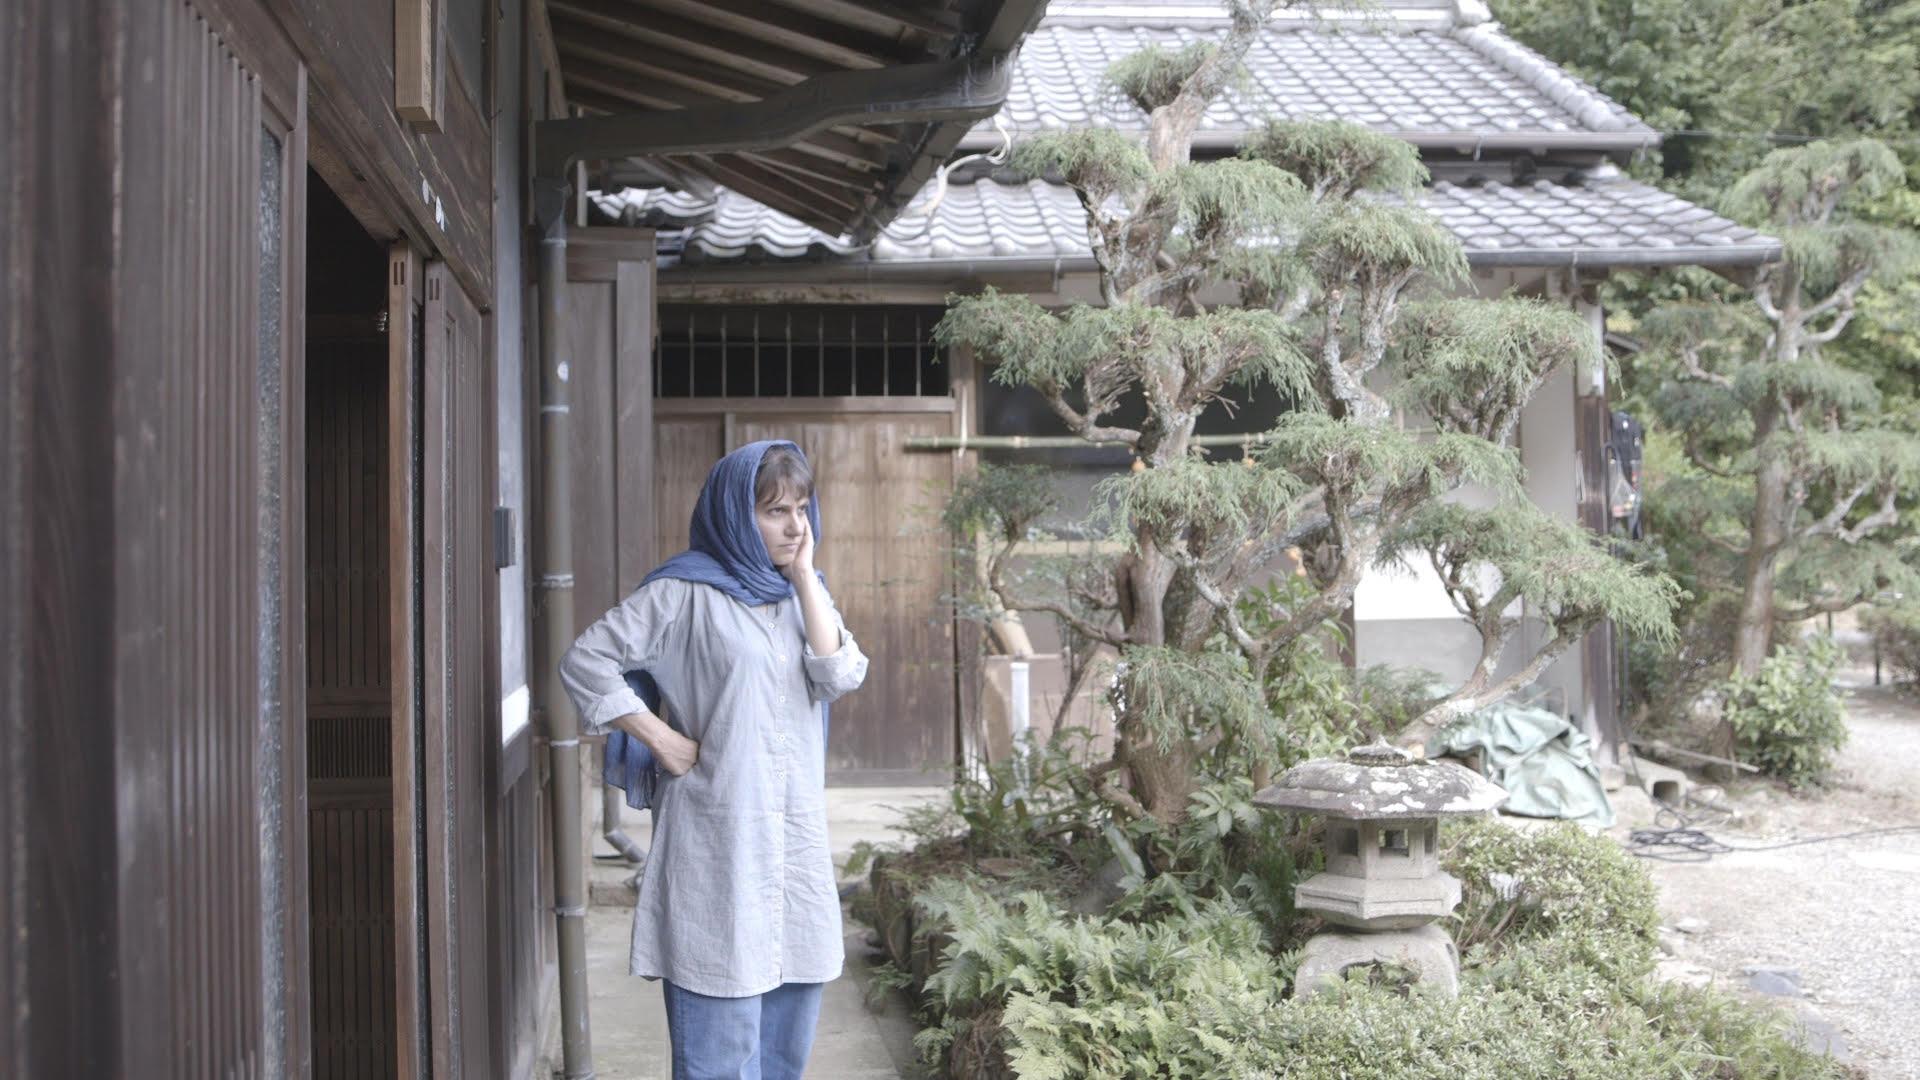 THE WIND FROM PERSIA    Nara-tive   dir. Misaki Matsui